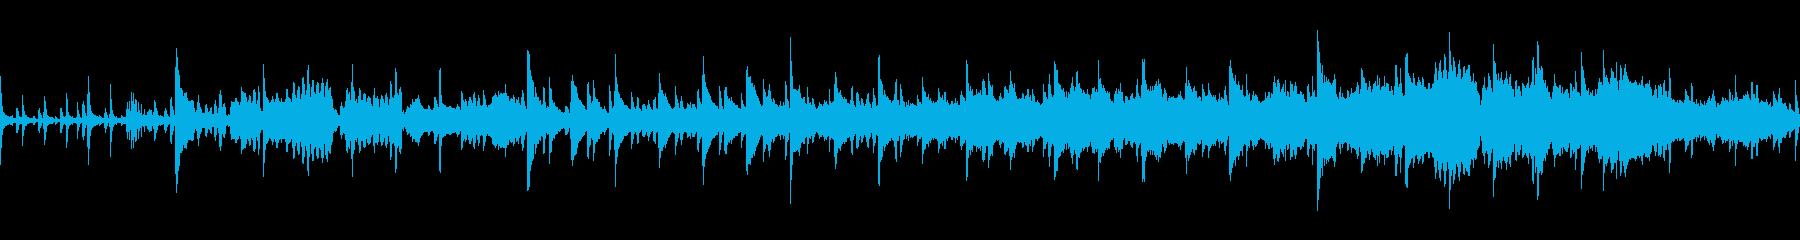 RPG:ダンジョン用BGM5の再生済みの波形